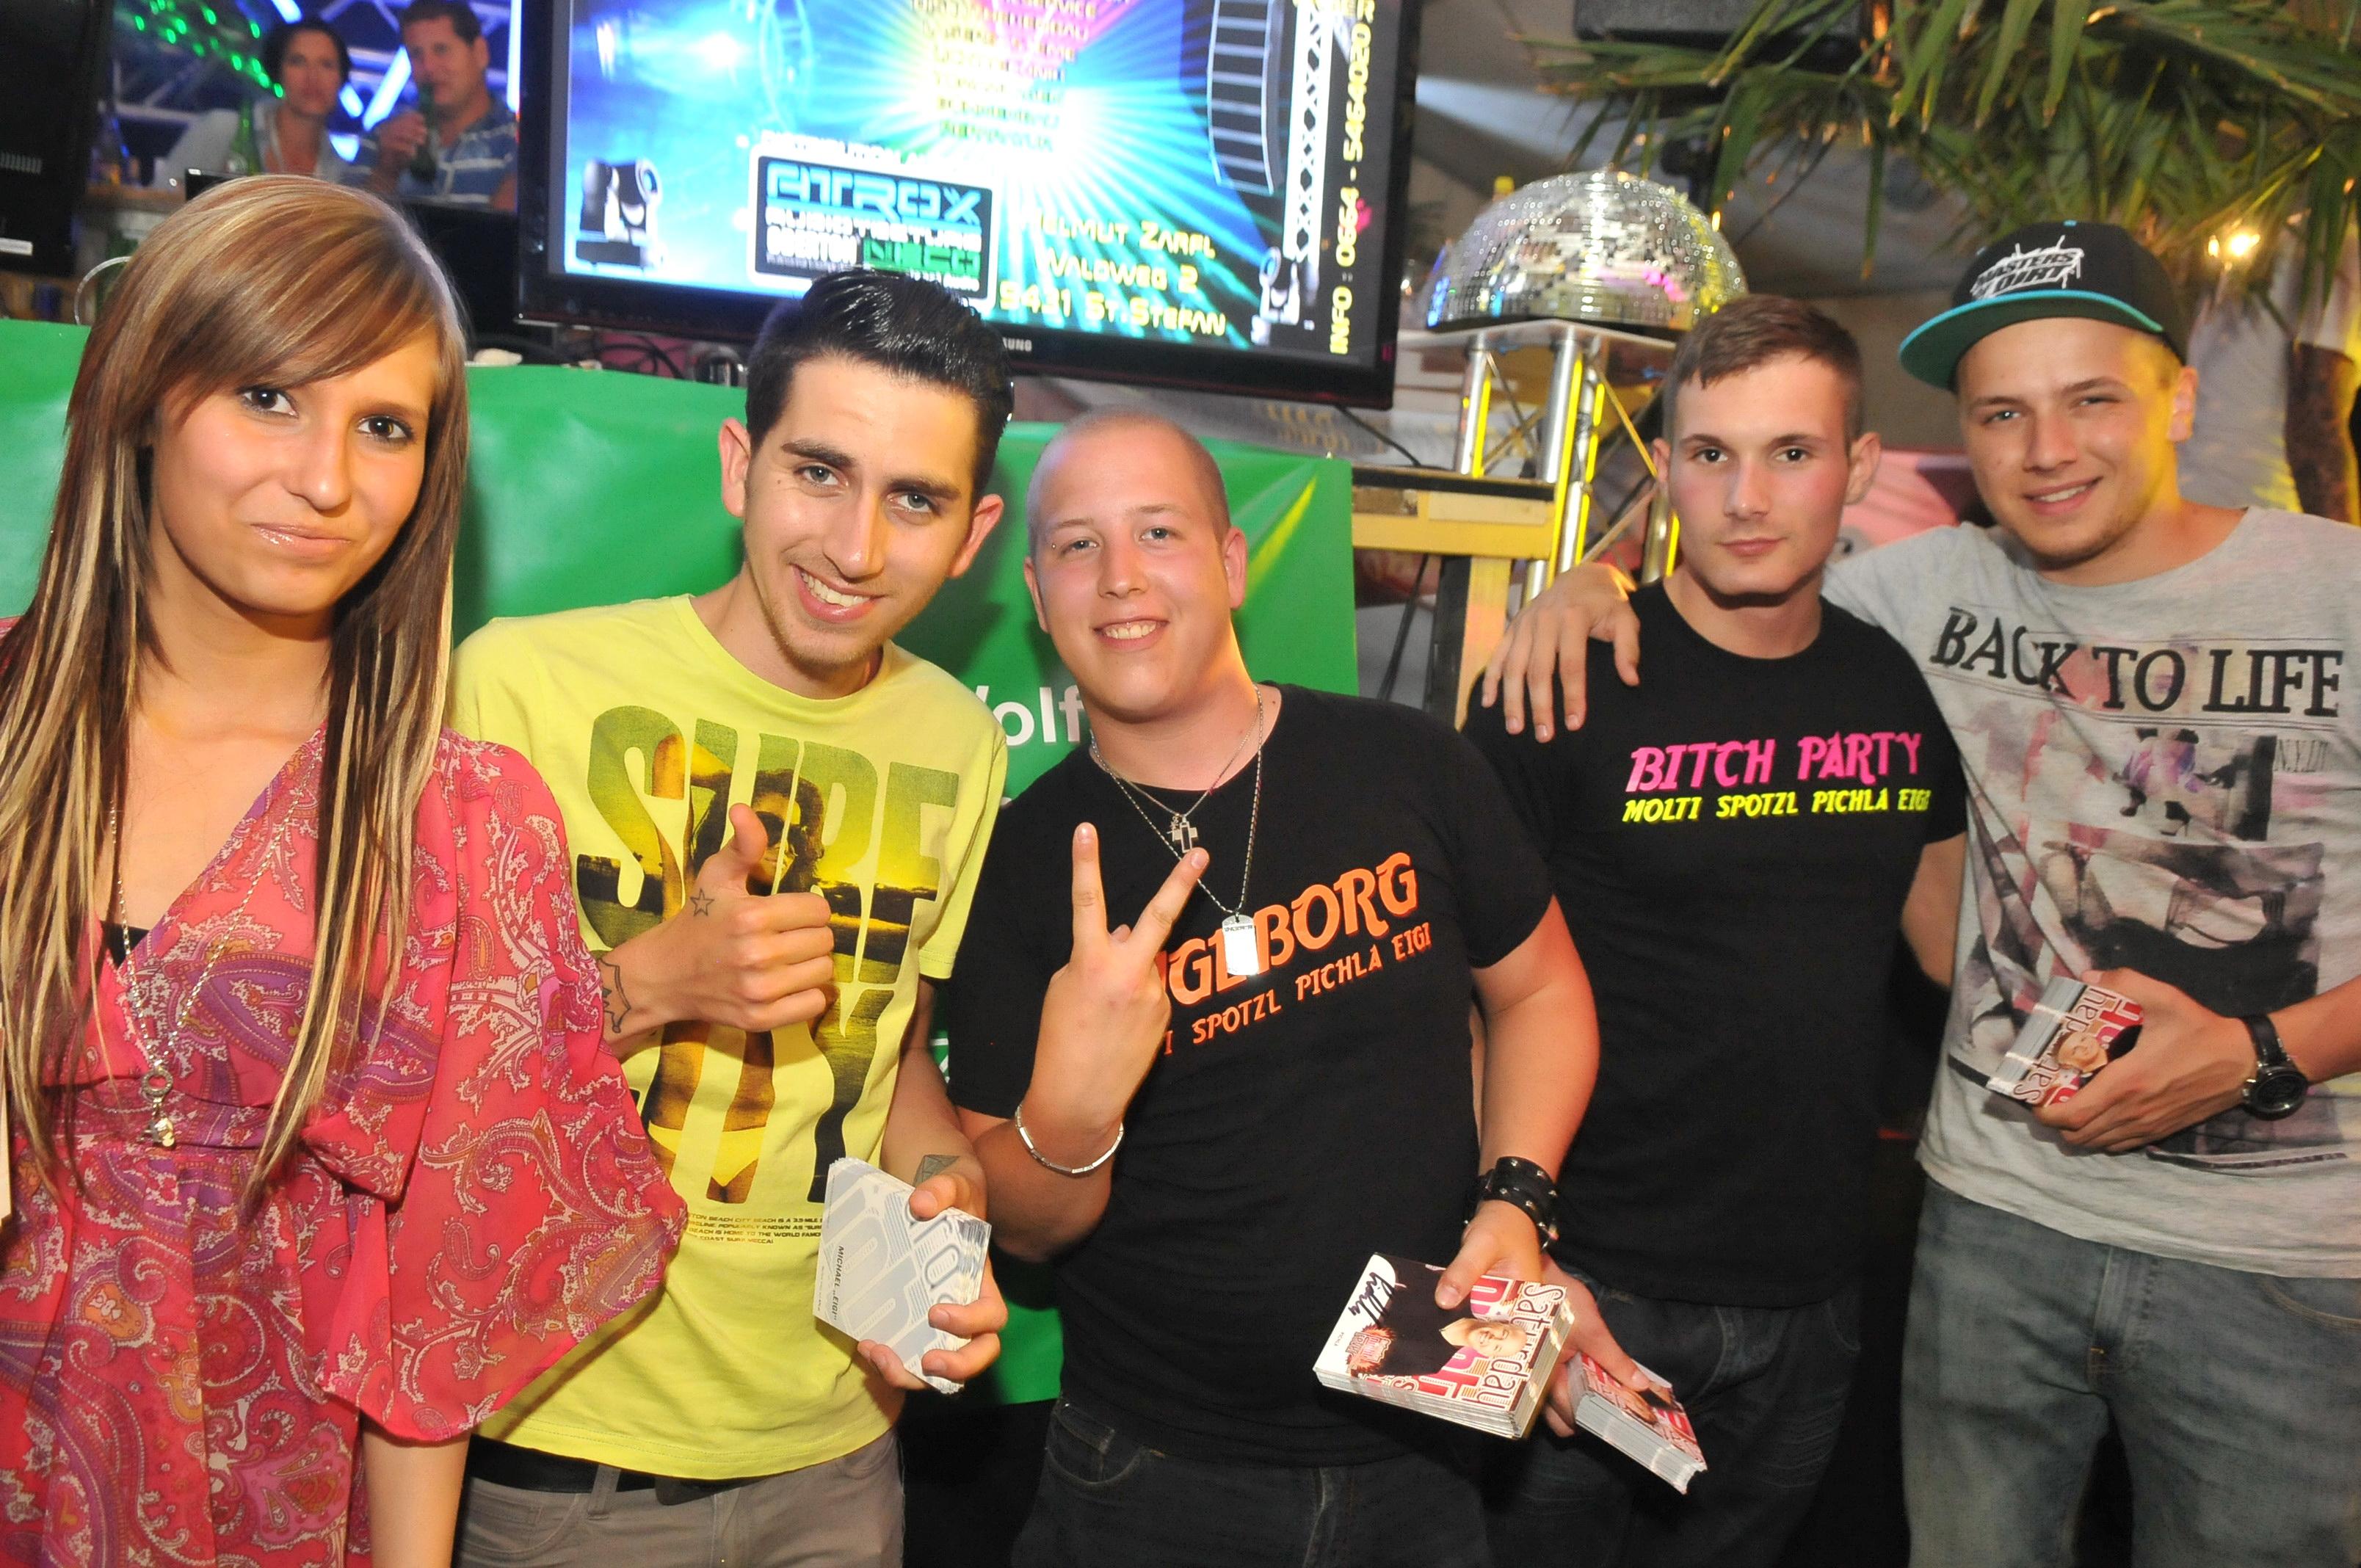 Festzelt Papageno mit Molti, Spotzl, Pichla, Eigi und Anni